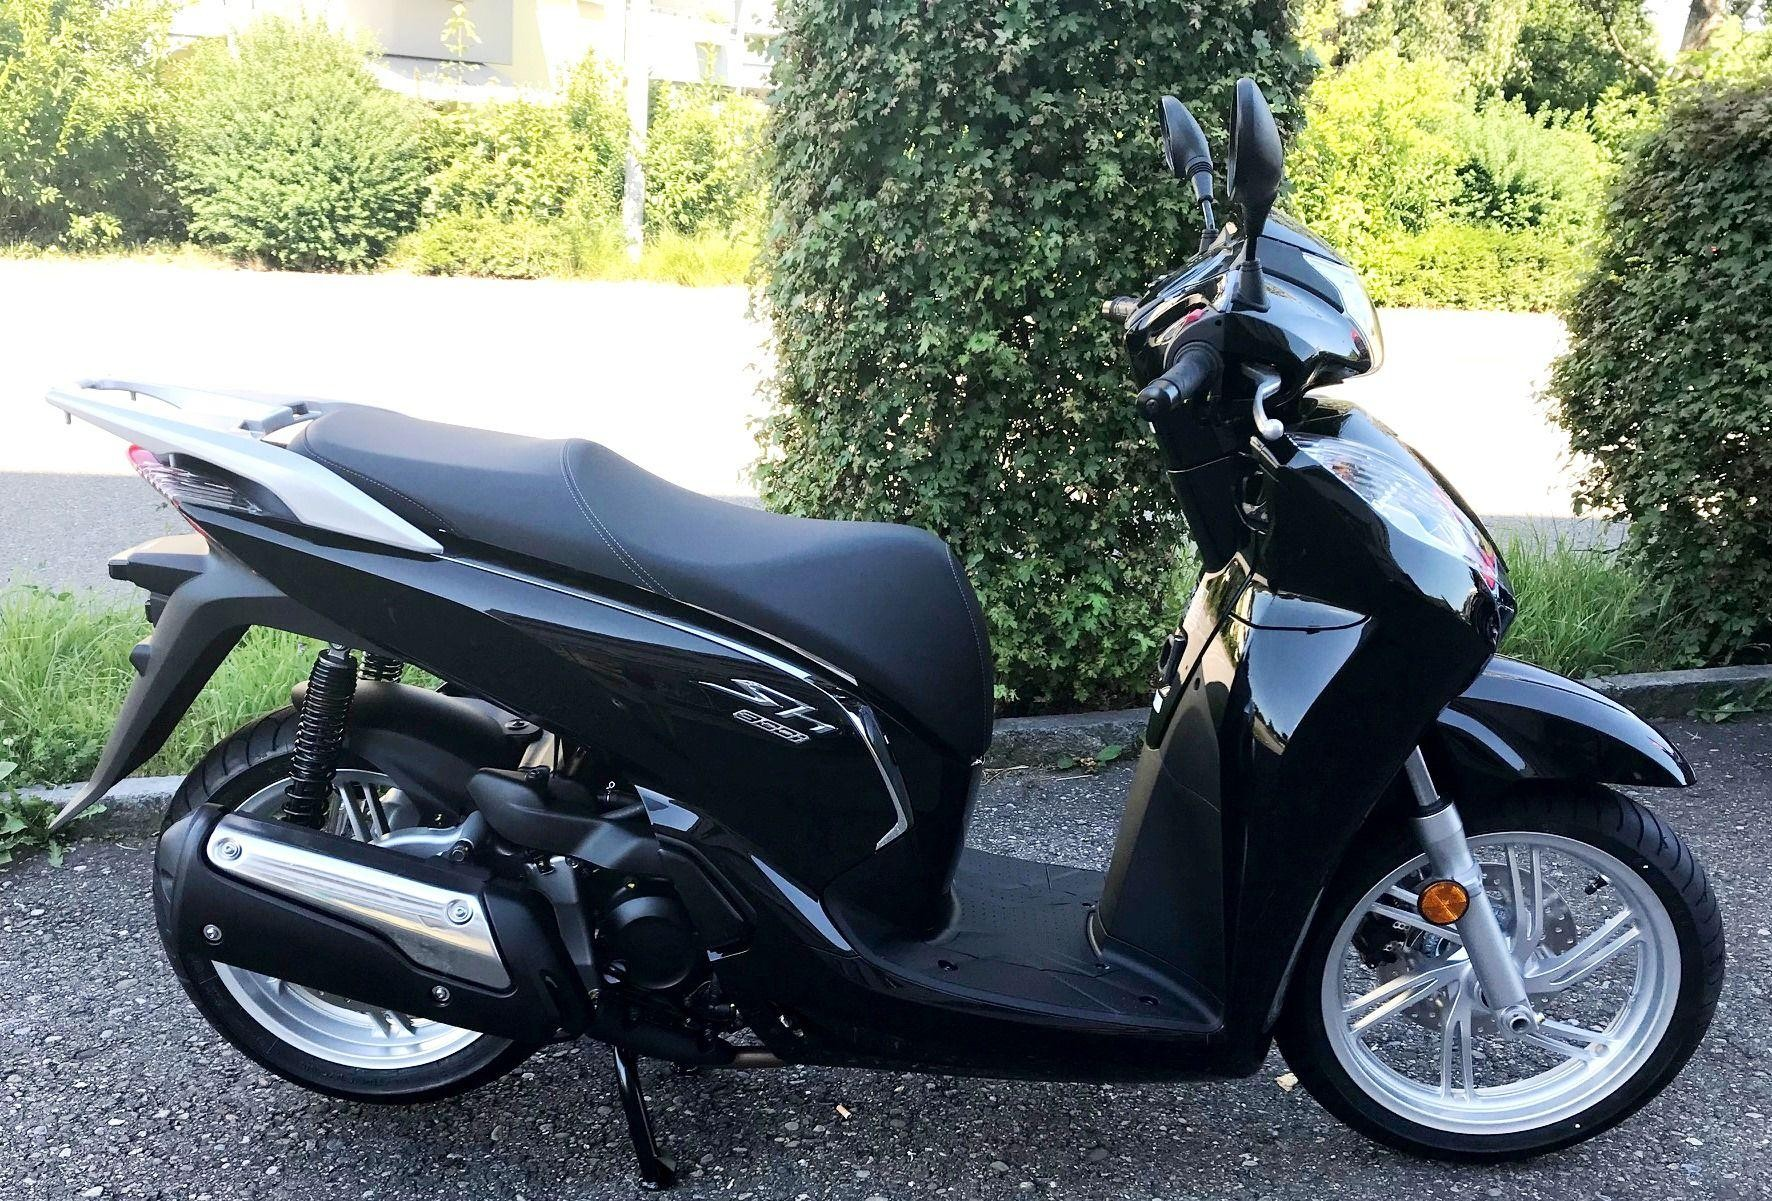 Buy Motorbike New Vehiclebike Honda Sh 300 I A Abs 2019 Joho